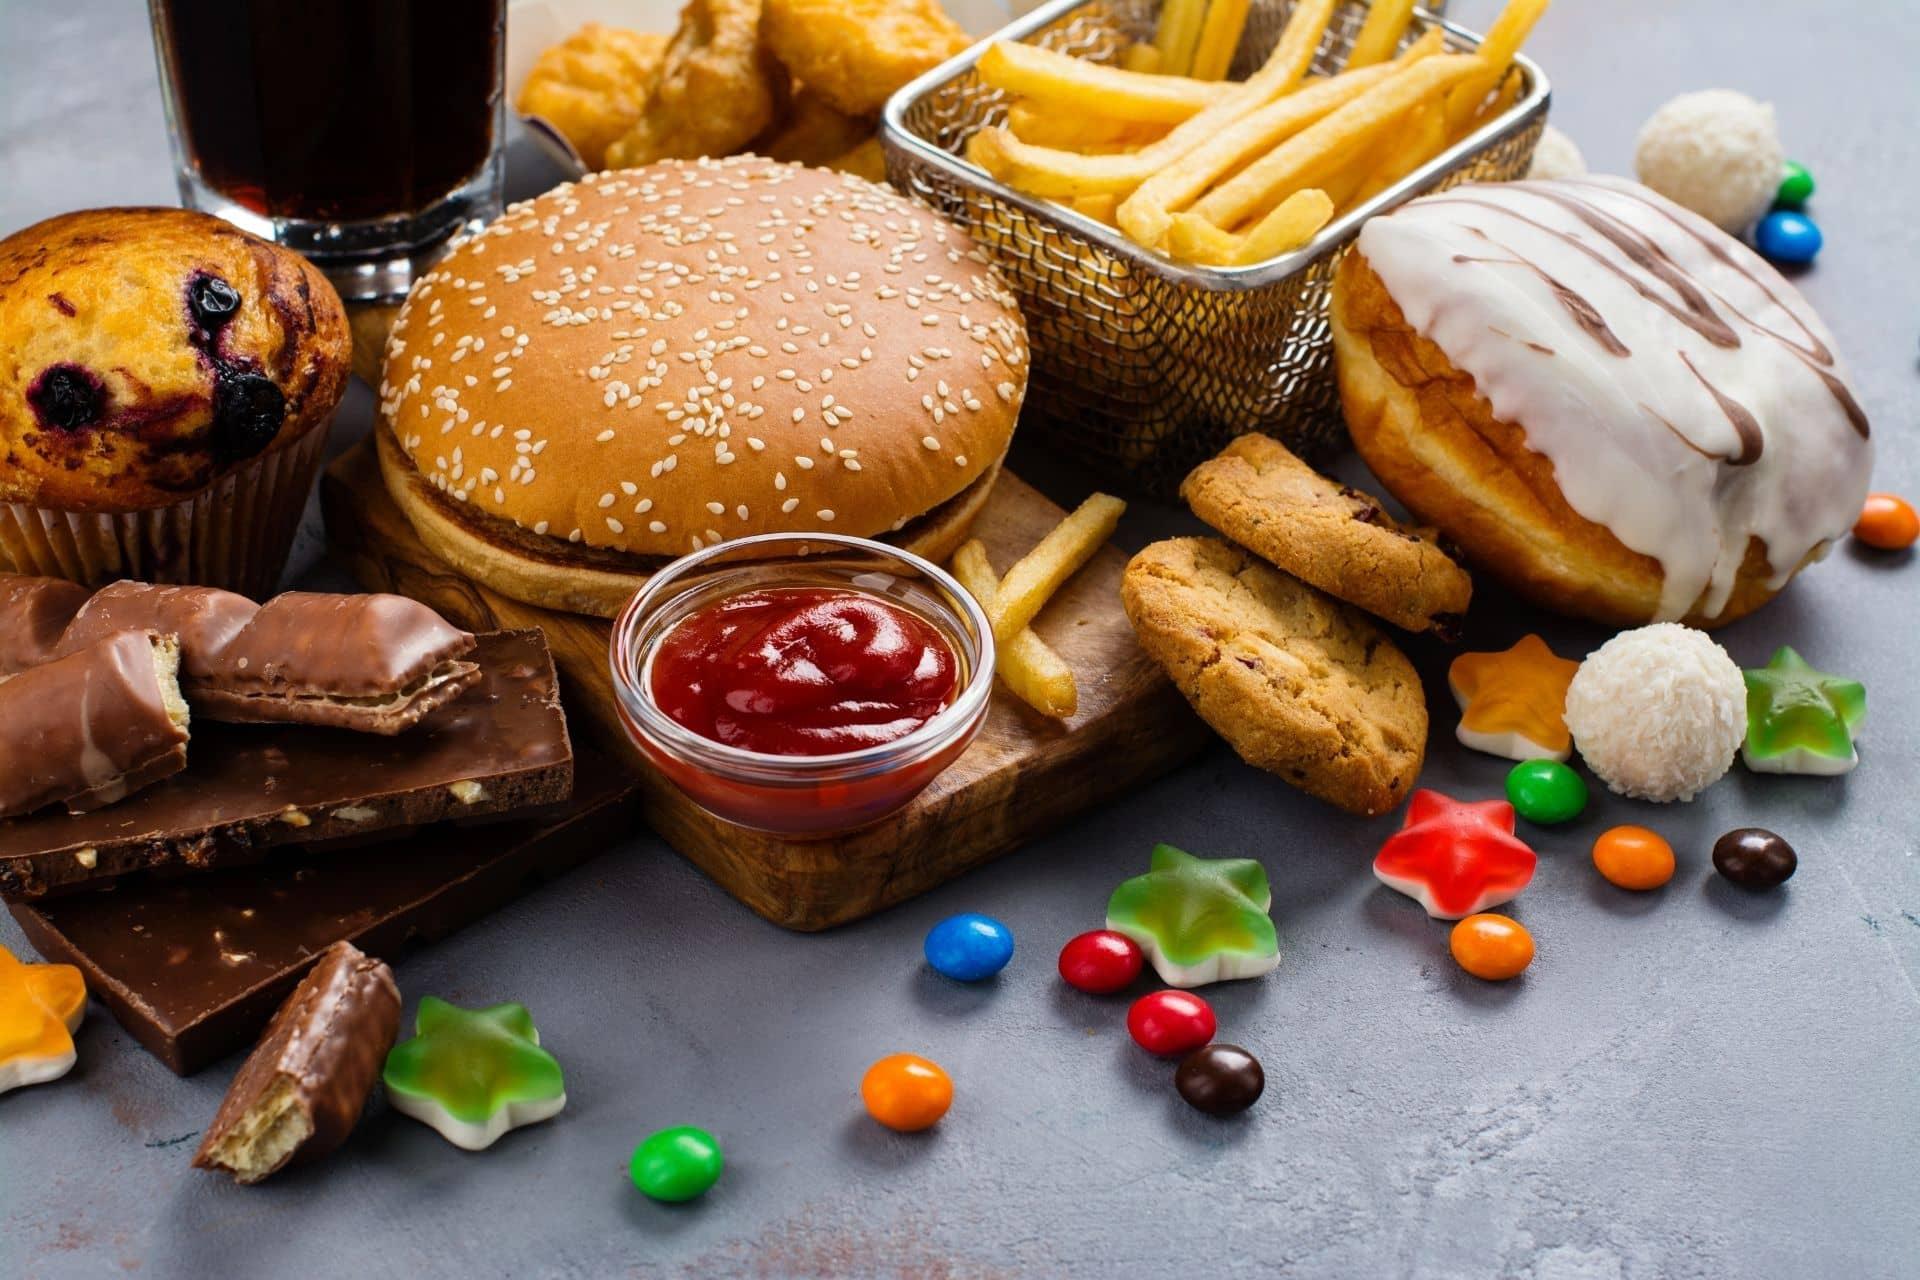 Alimentation riche en glucides simples microbiote intestinal Nahibu